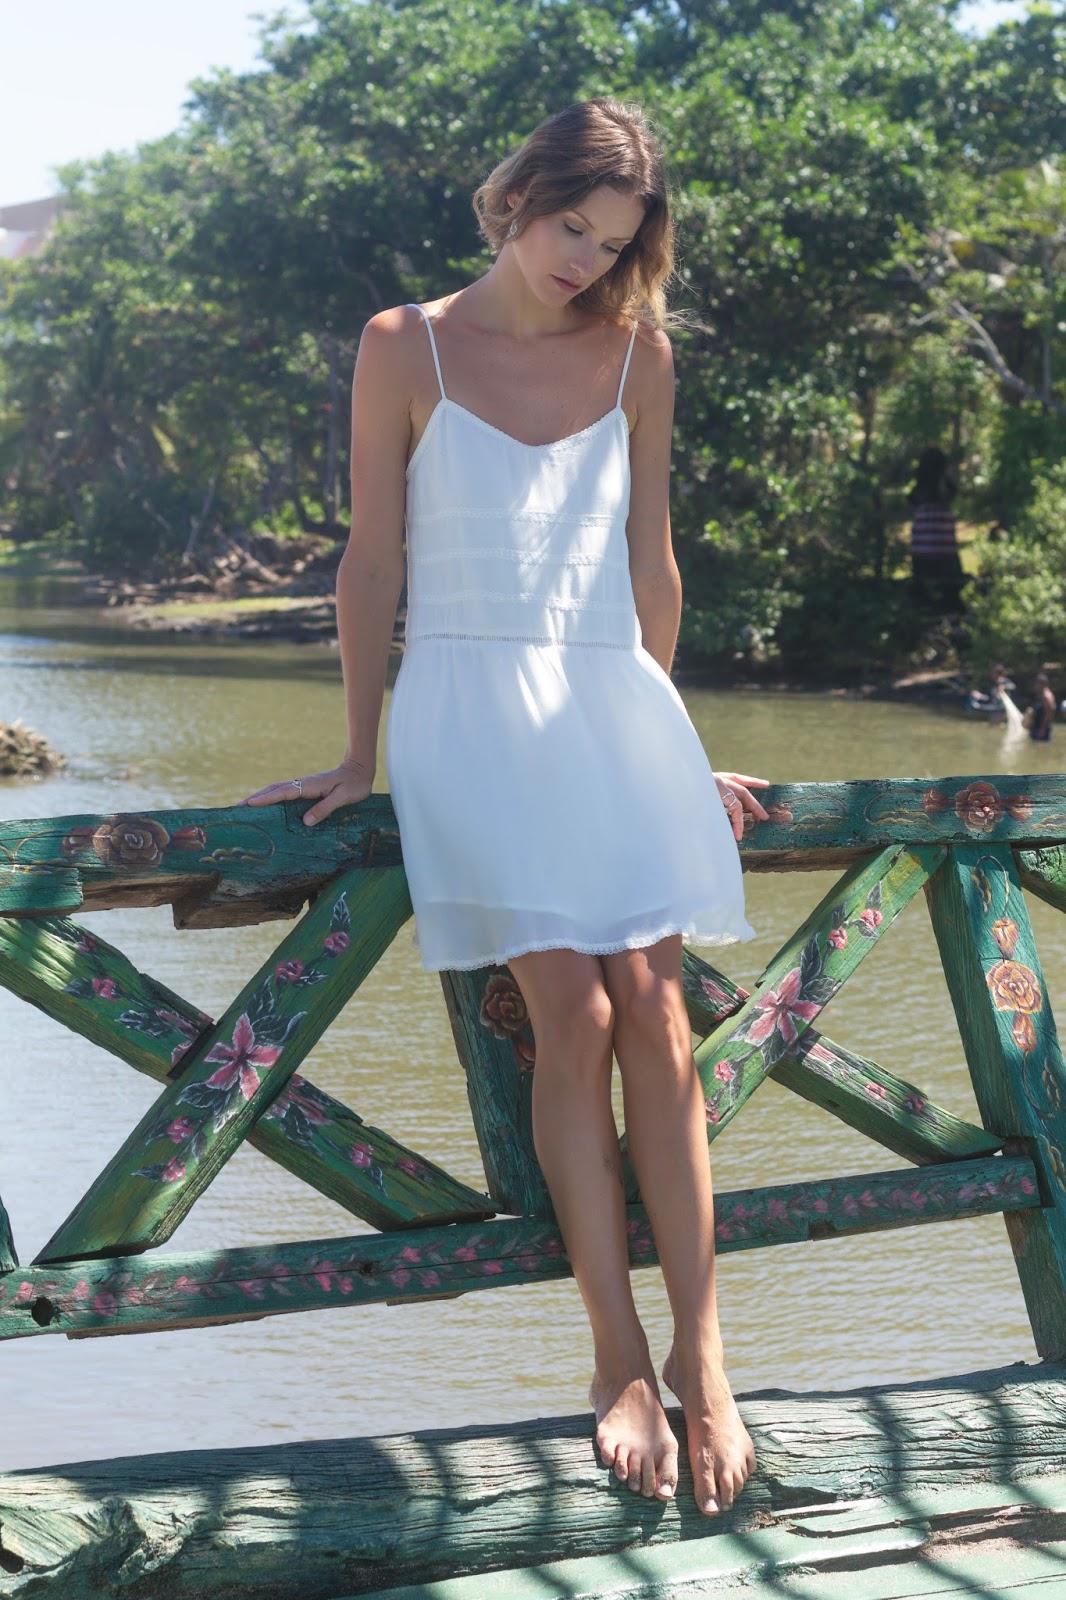 Fashion blogger and designer, Alison Hutchinson, is wearing a KAYVALYA Maya Dress in white